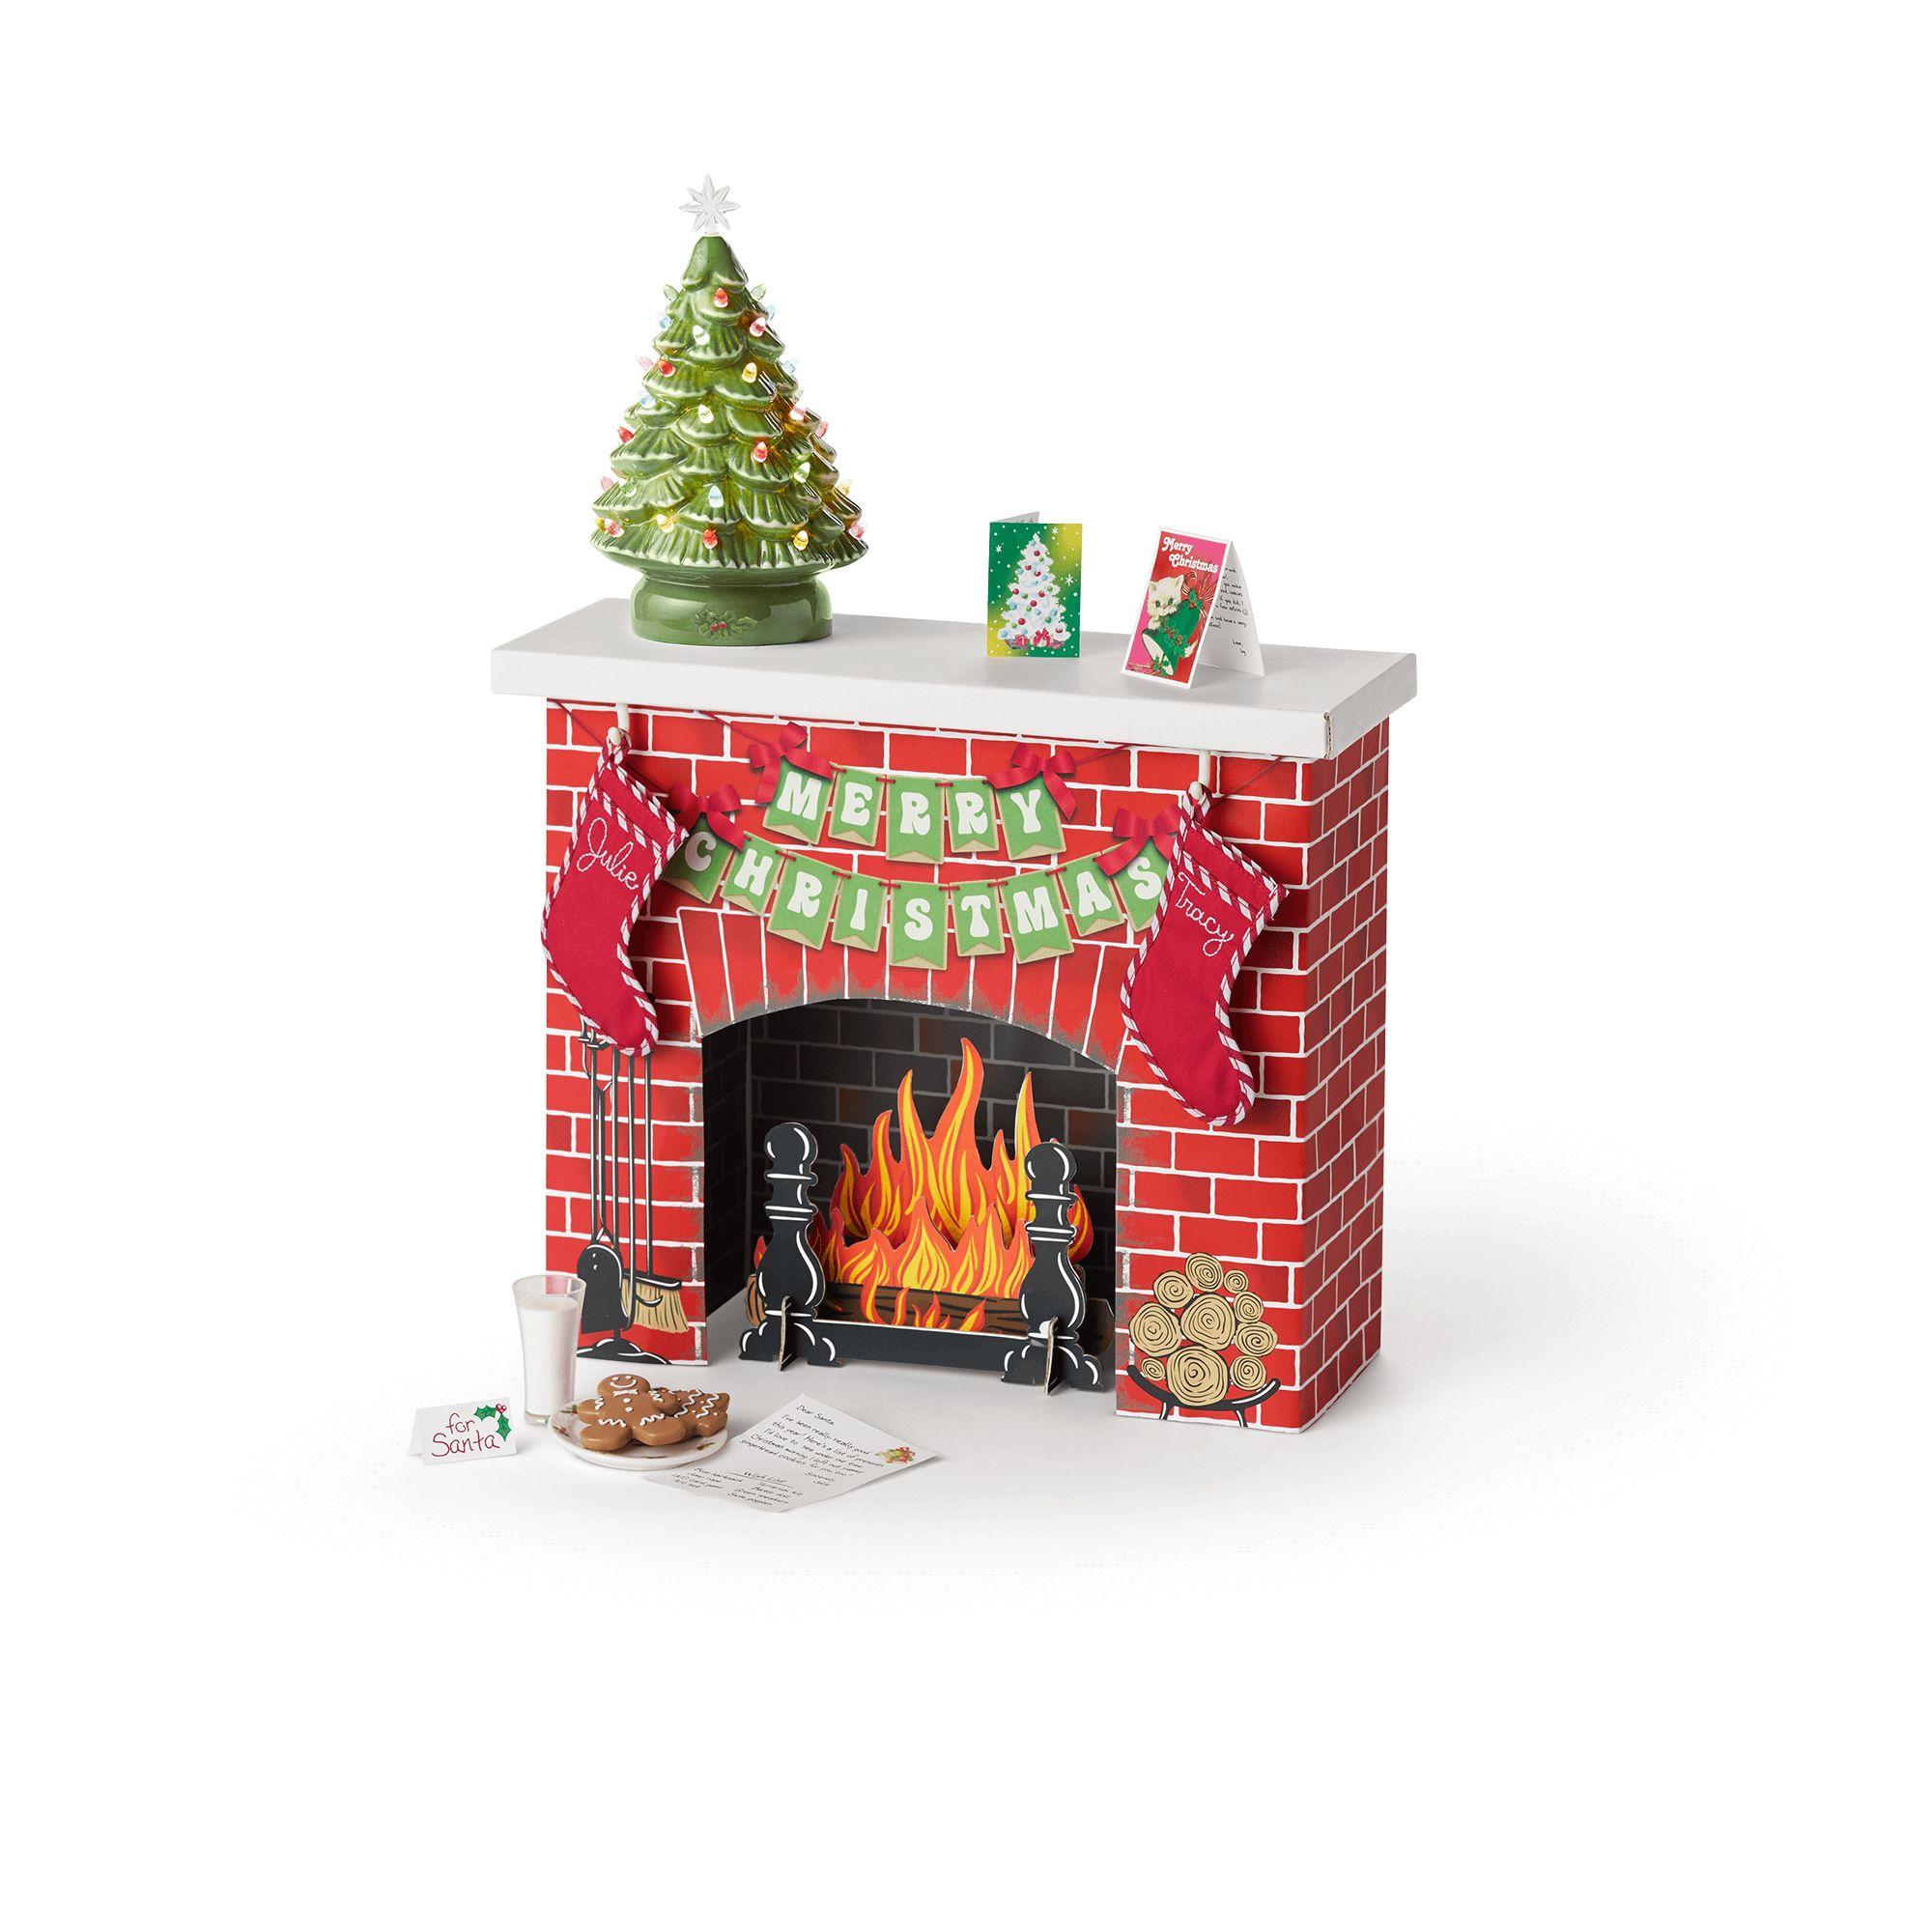 Julie's Christmas Fireplace